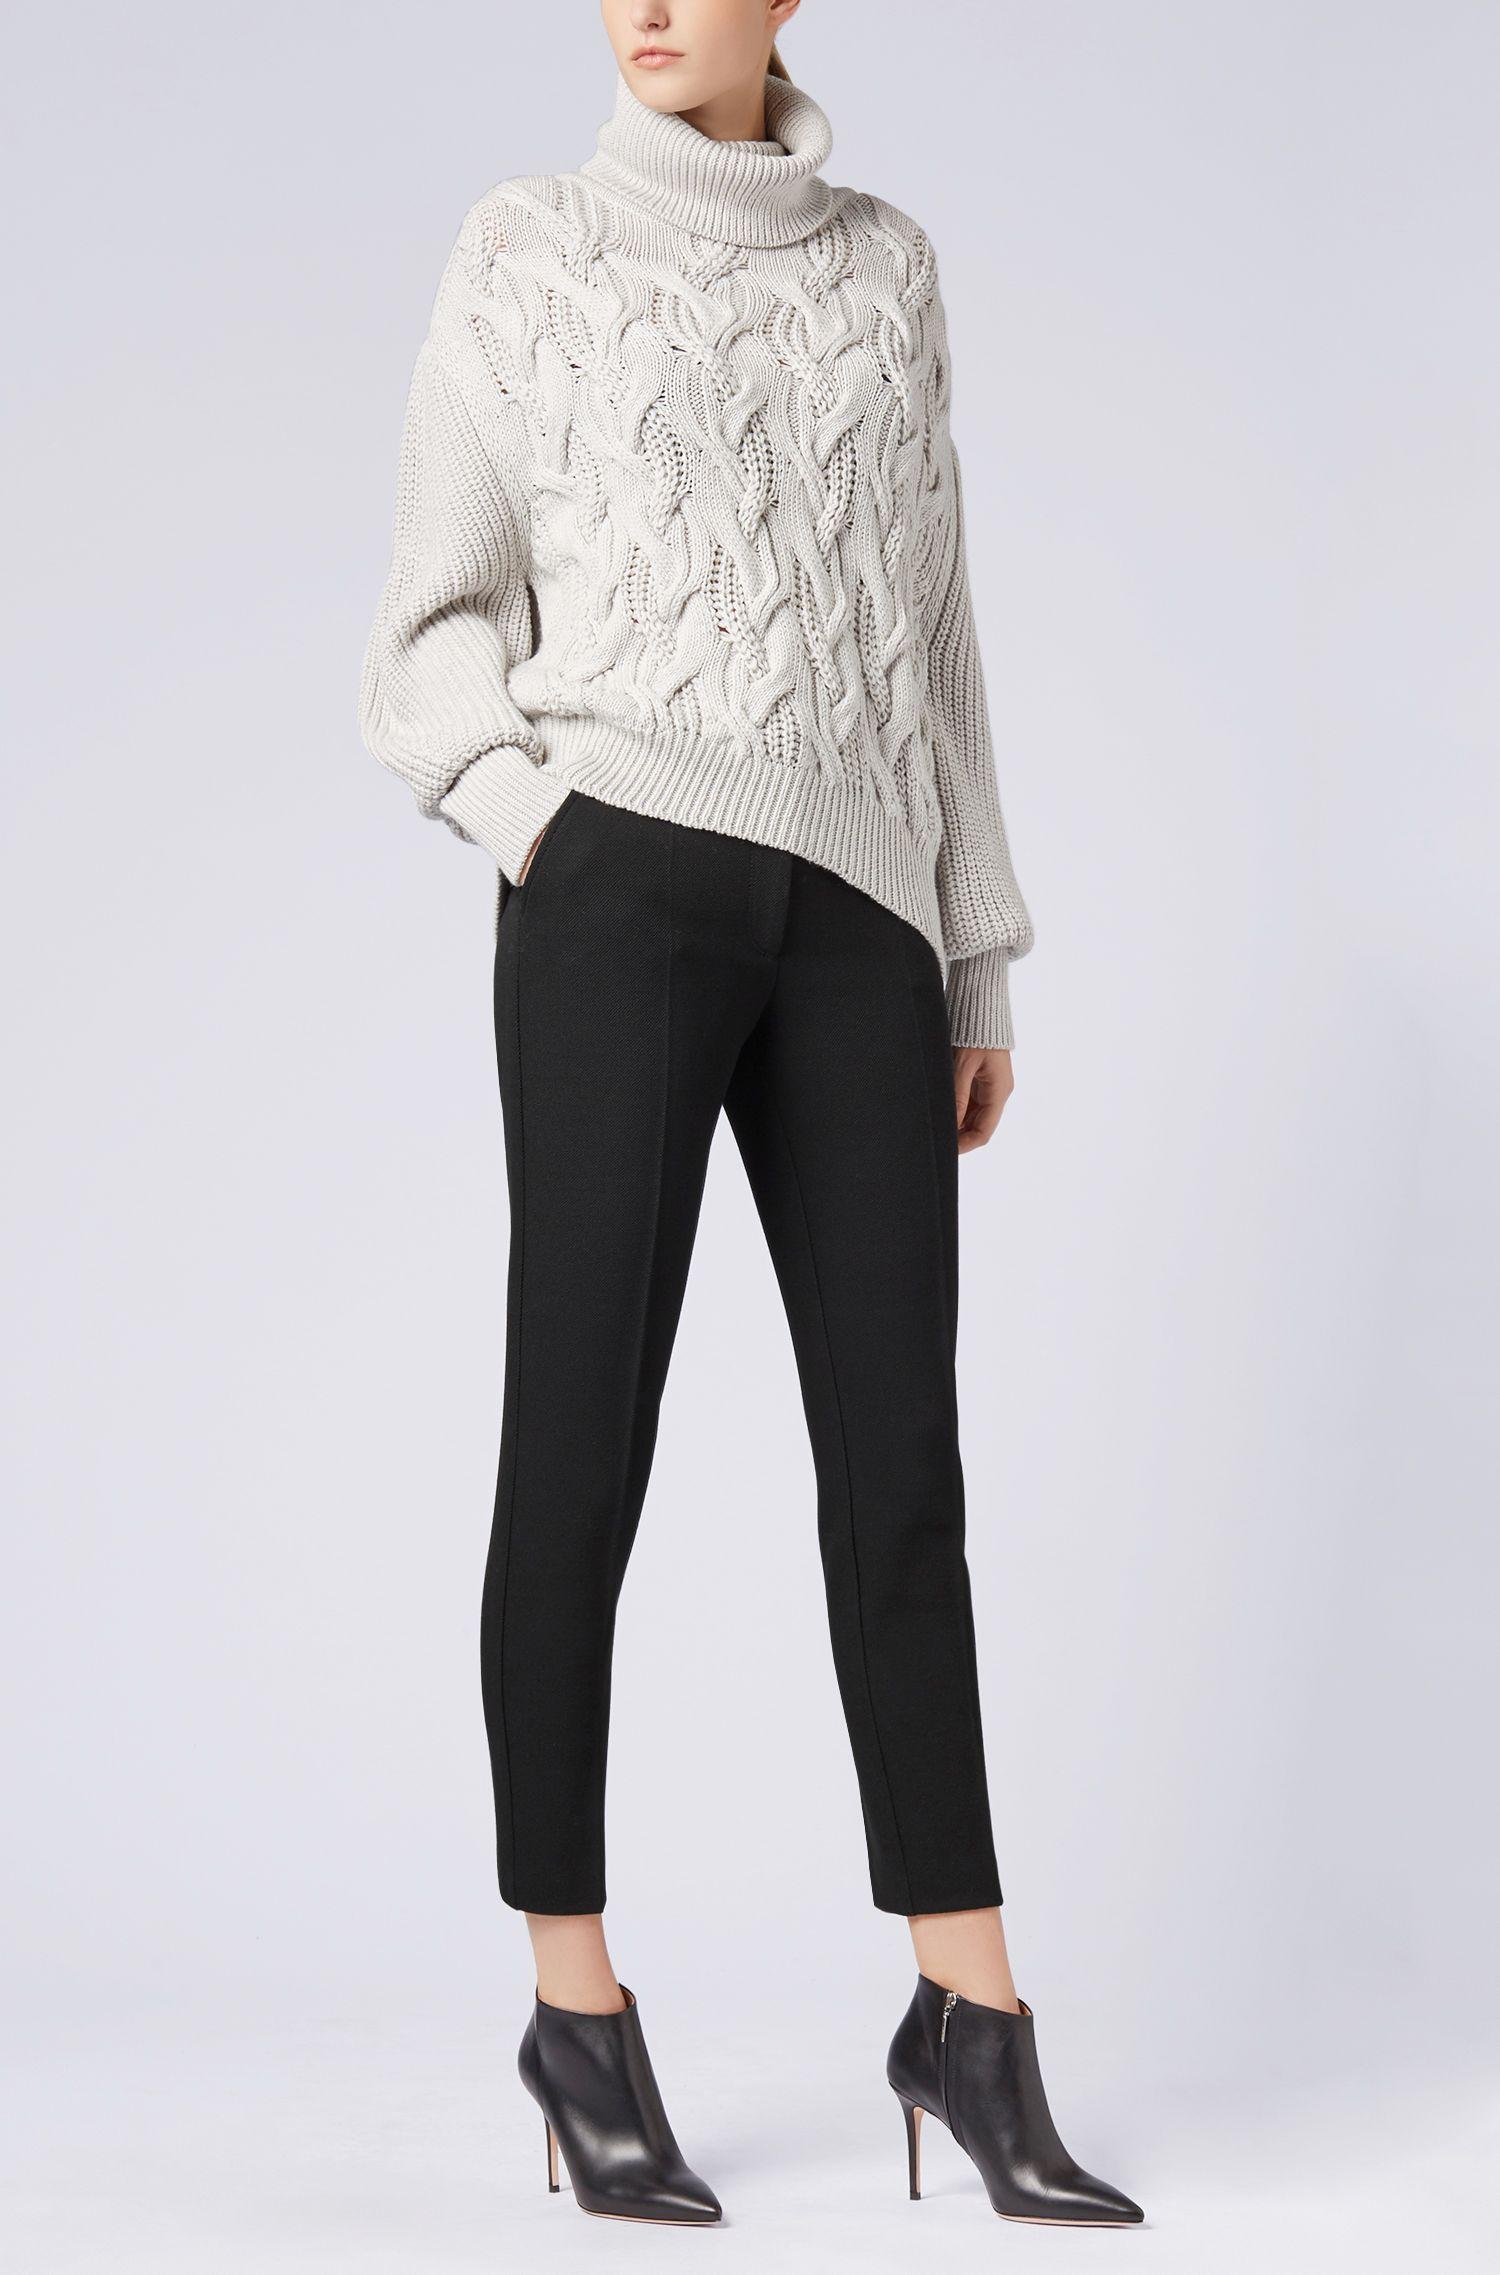 Pantalones tobilleros regular fit en suave crepé elástico, Negro